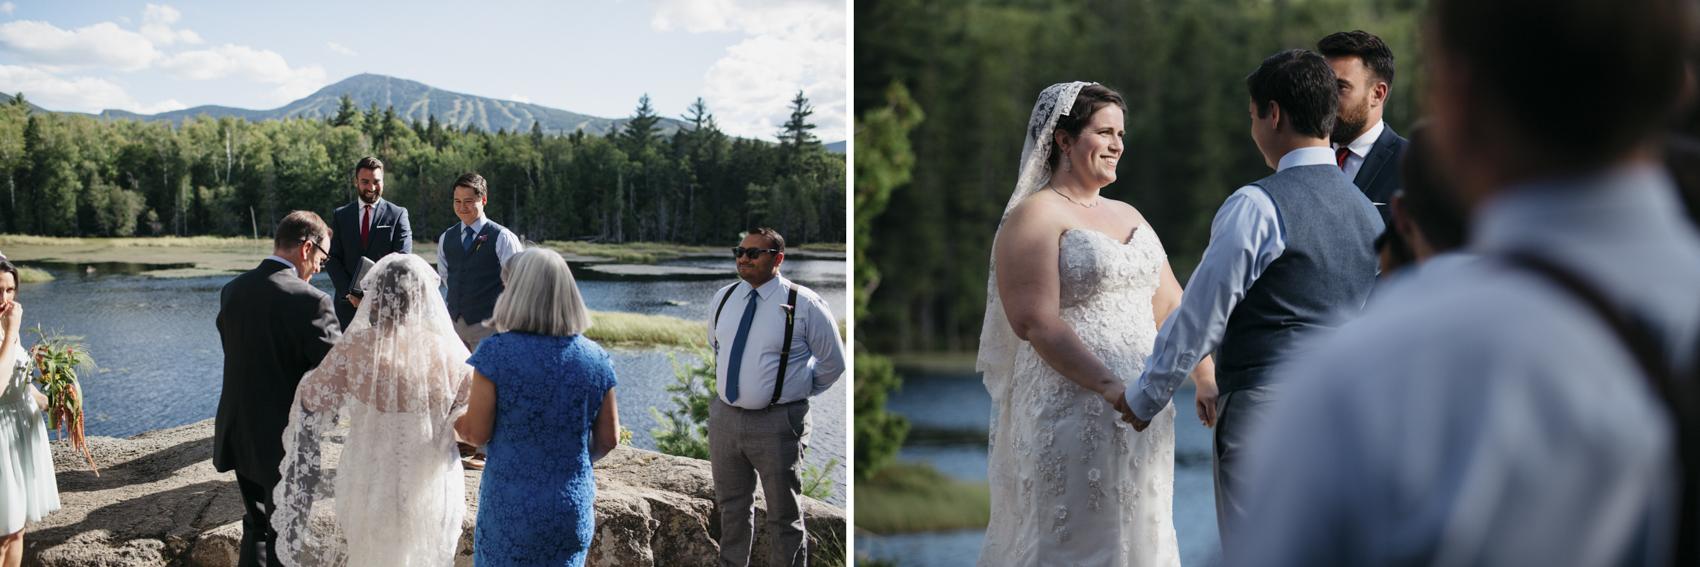 LFA_JuliaGlenn_Sugarloaf_Maine_Wedding010.jpg